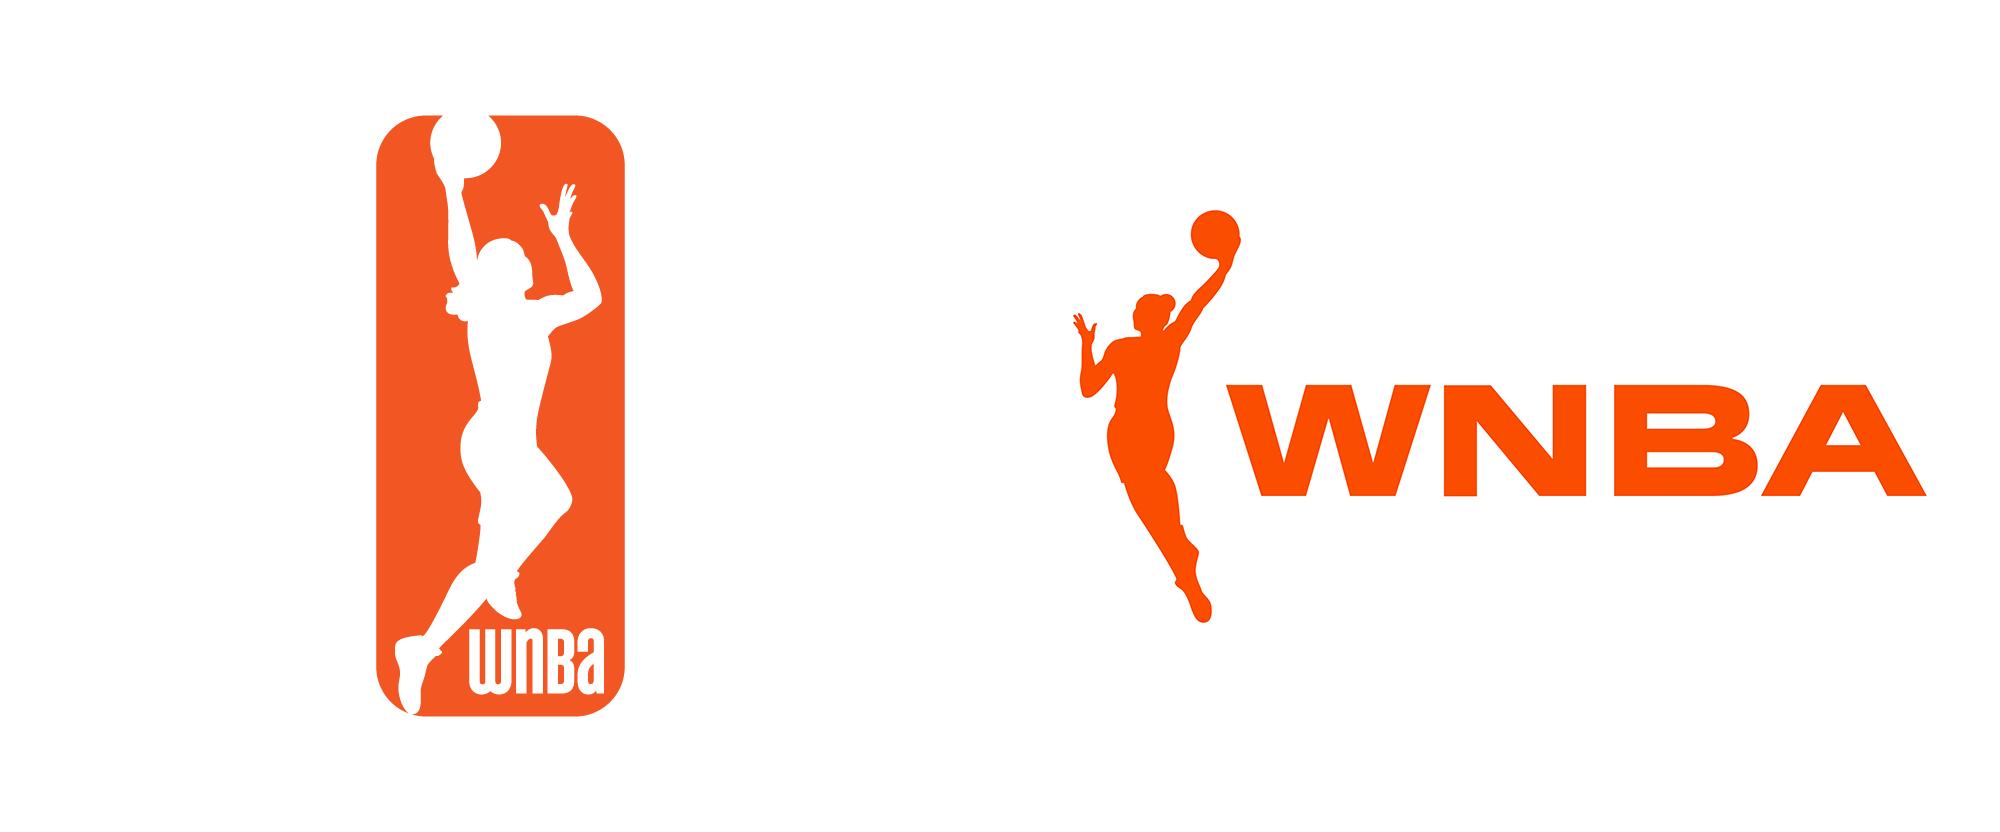 2019 WNBA Logo.